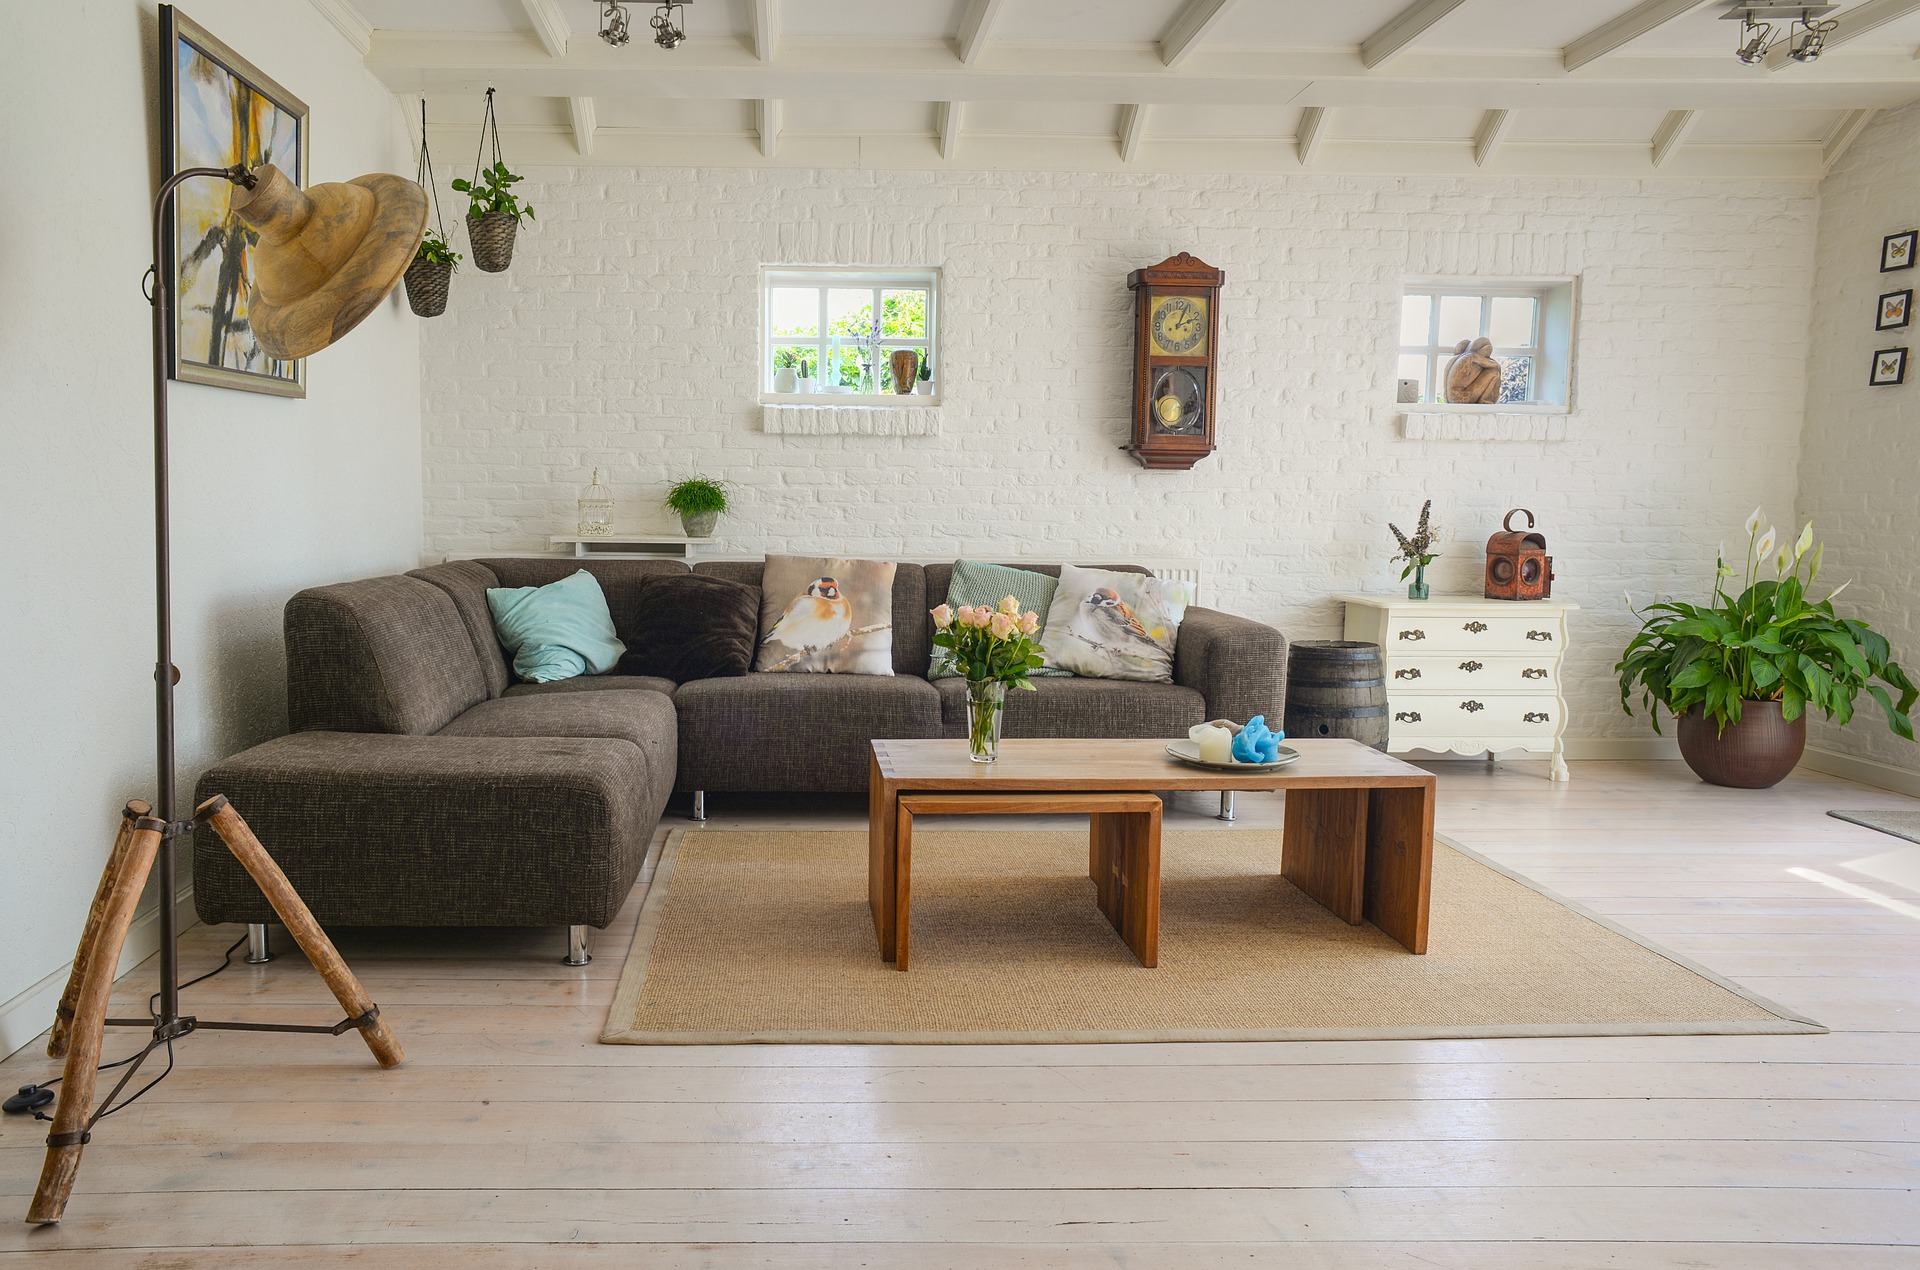 Best Place Cheap Furniture